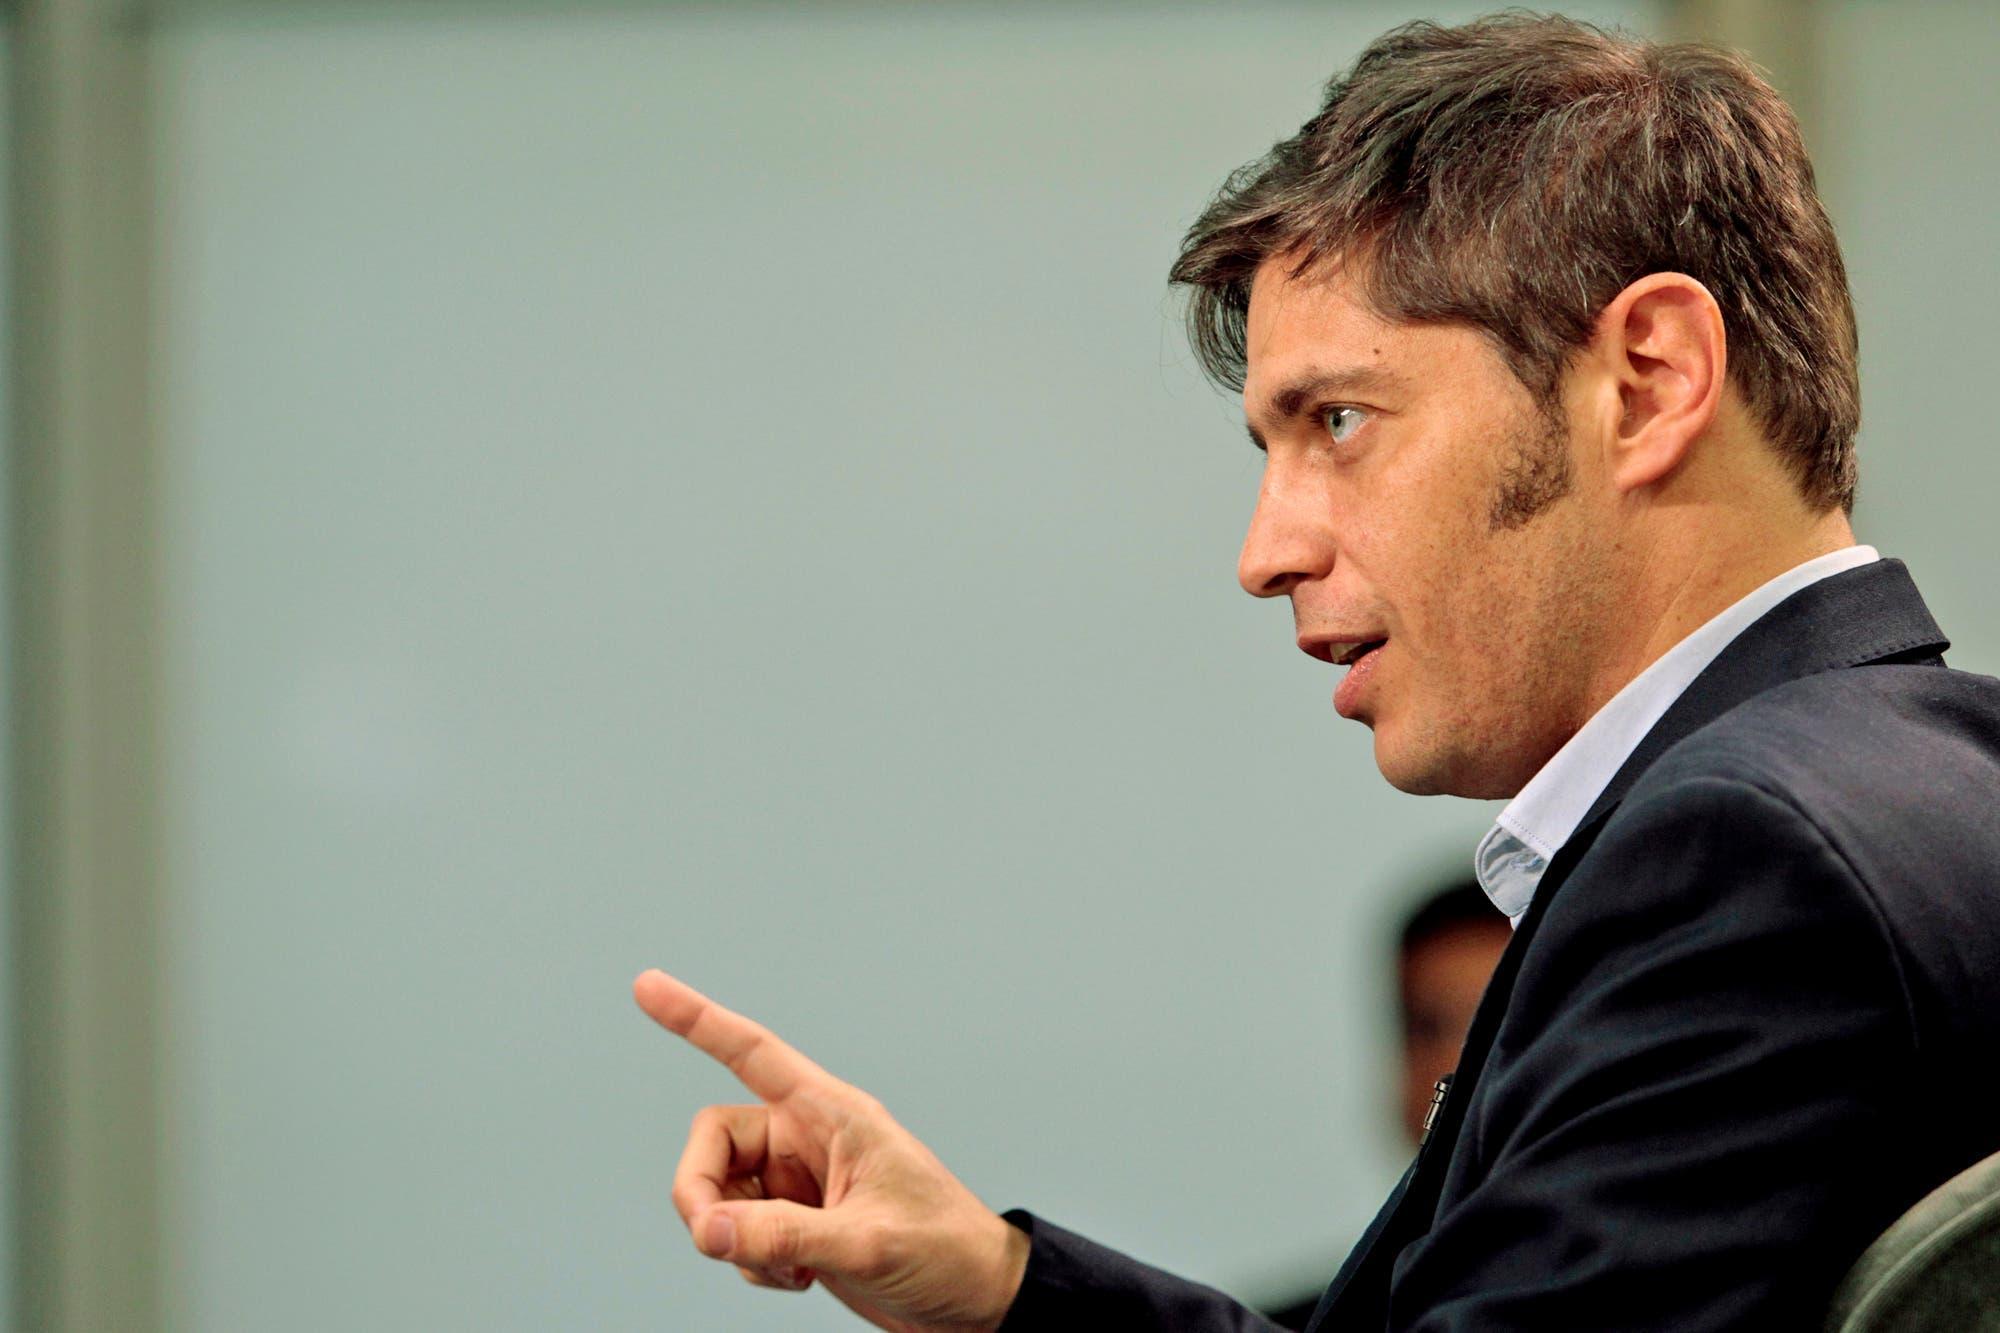 Axel Kicillof se despegó del ataque verbal de Aníbal Fernández a Vidal